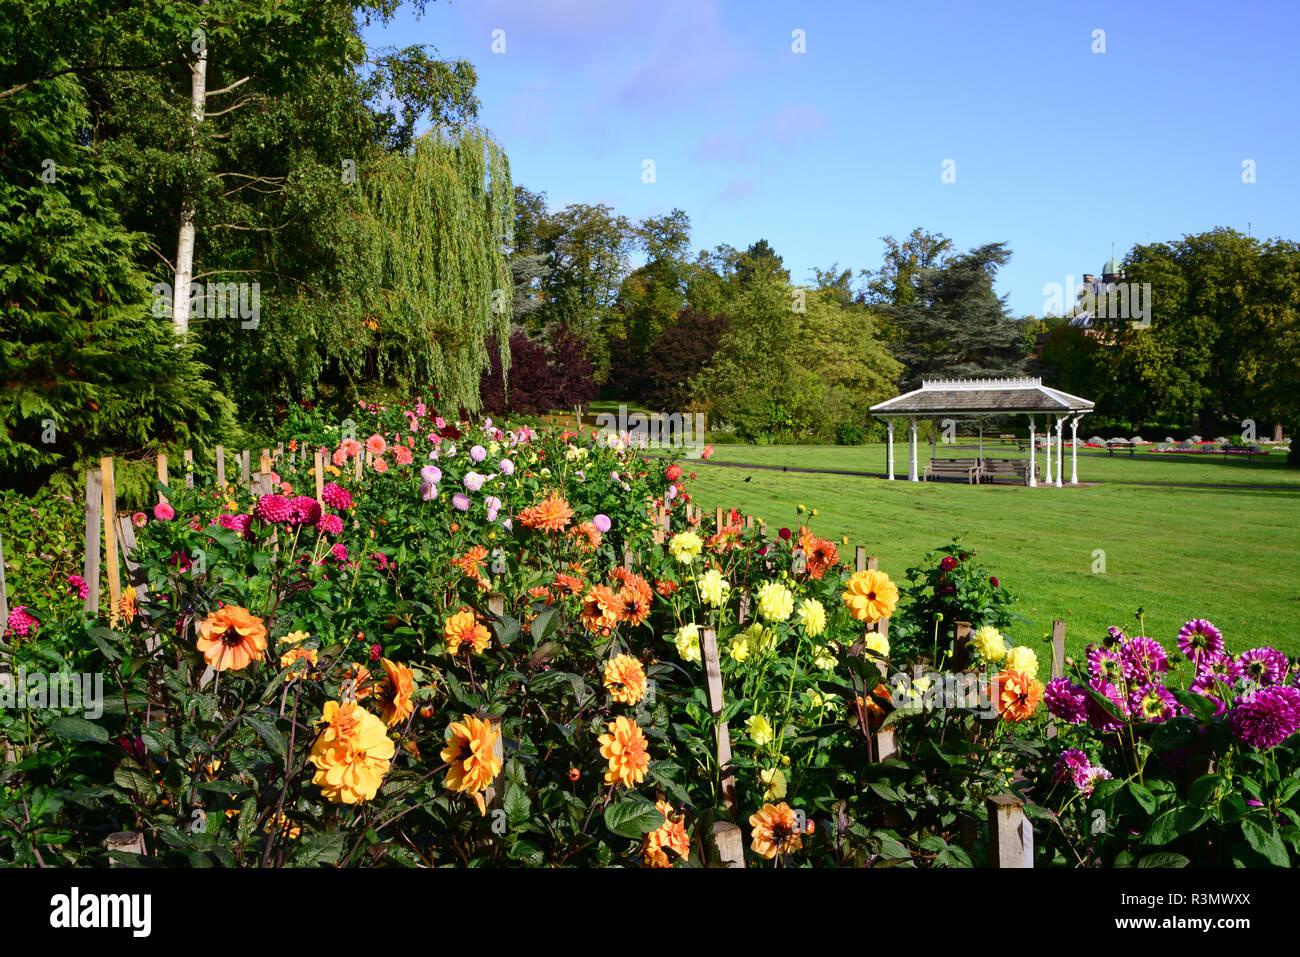 pavillion in valley gardens park harrogate yorkshire united kingdom Stock Photo